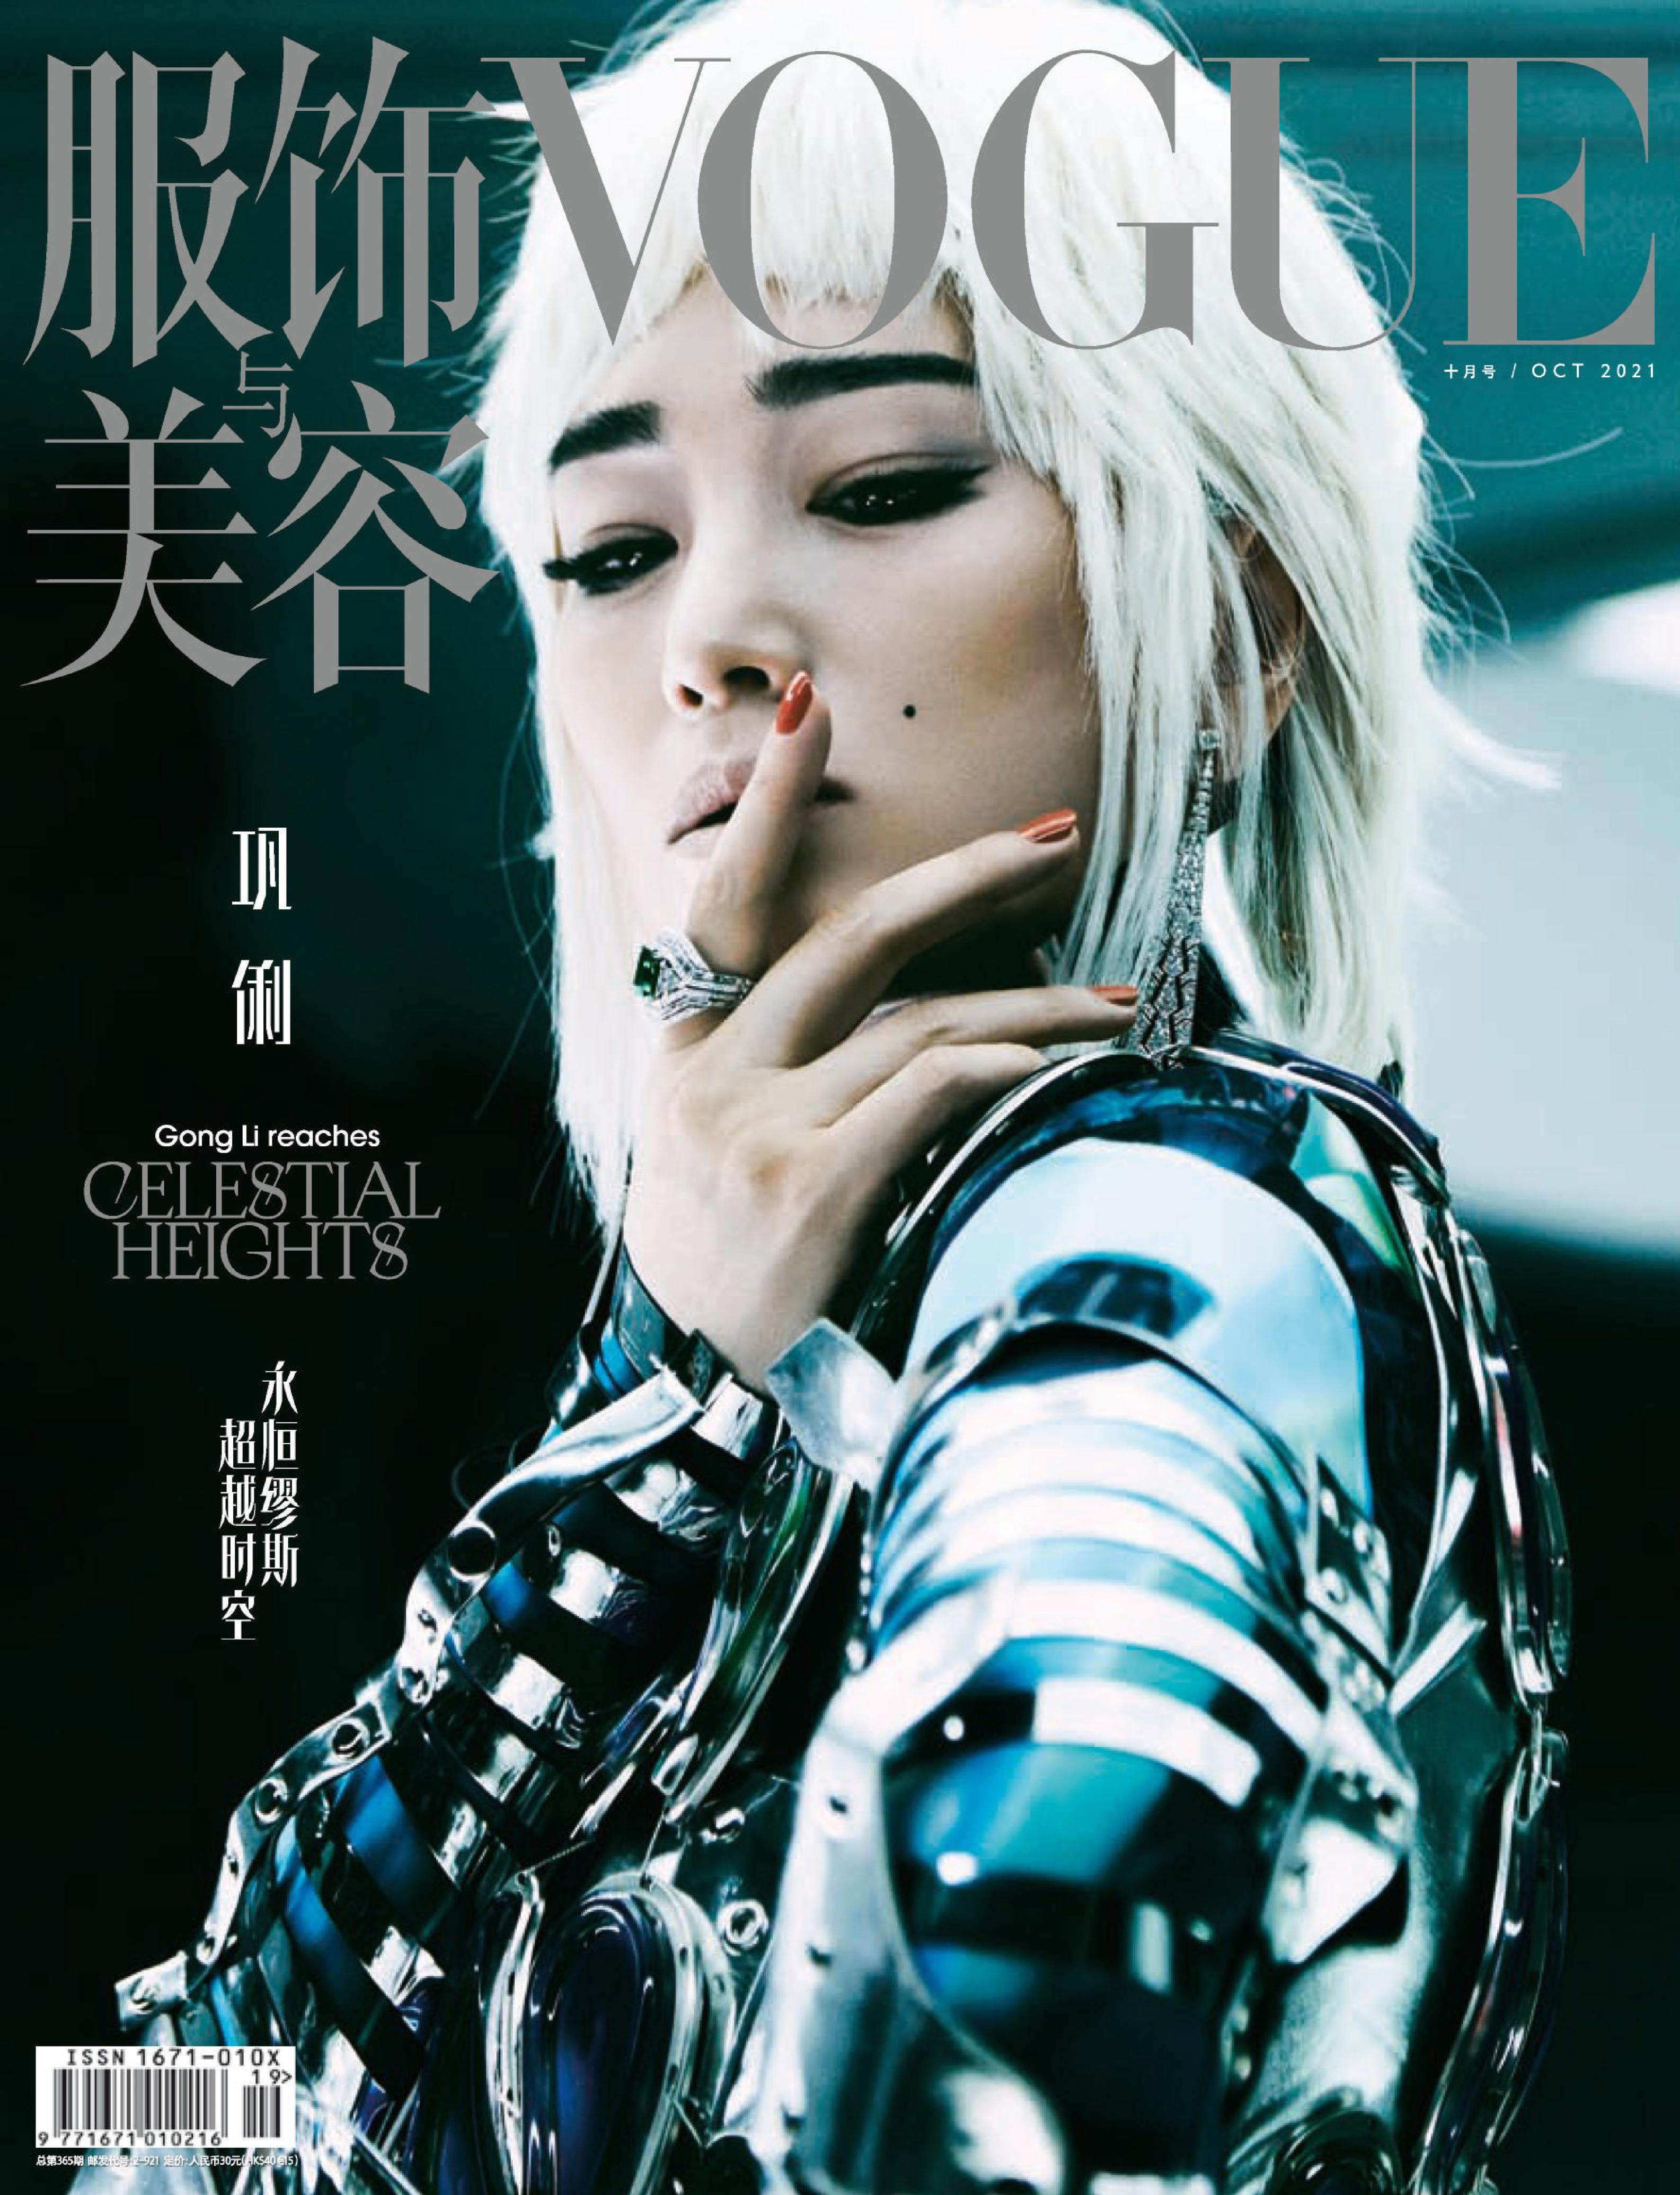 Vogue 服饰与美容 - 九月 2021